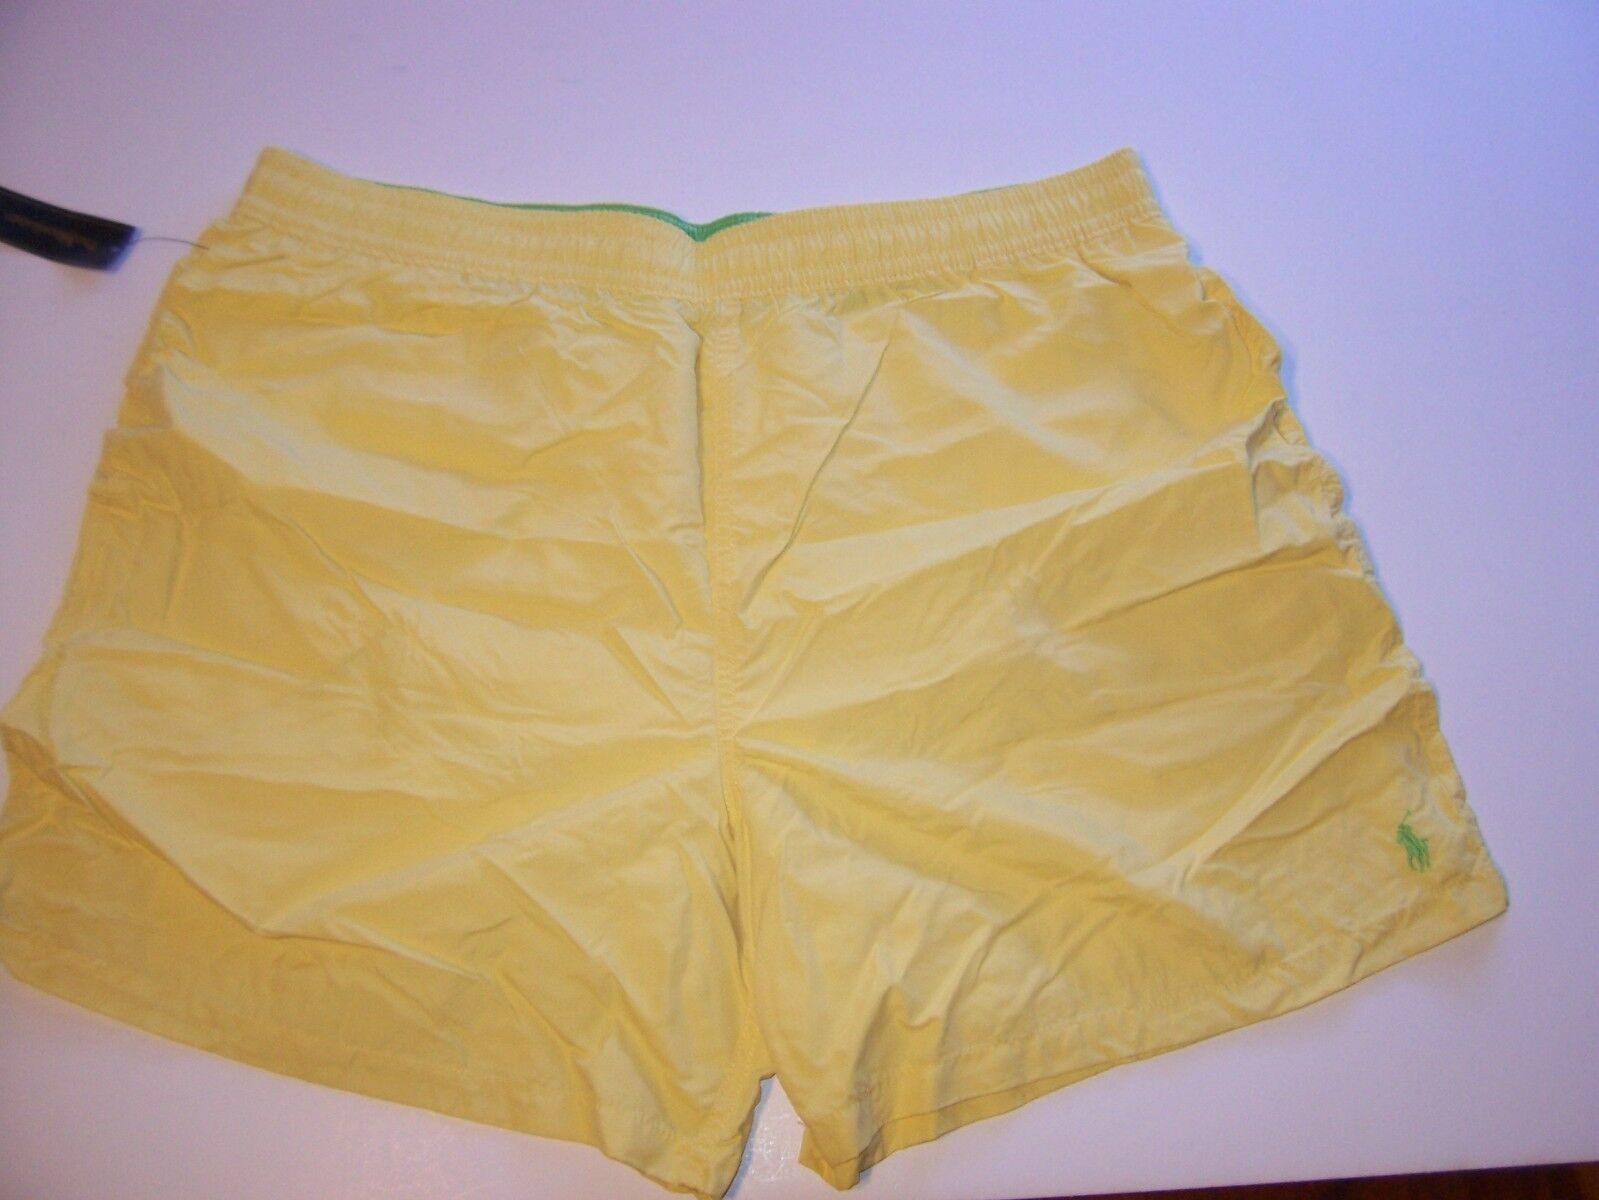 NEW Polo Ralph Lauren swimsuit boxer trunks swim shorts yellow 2XB 3XB 4XB